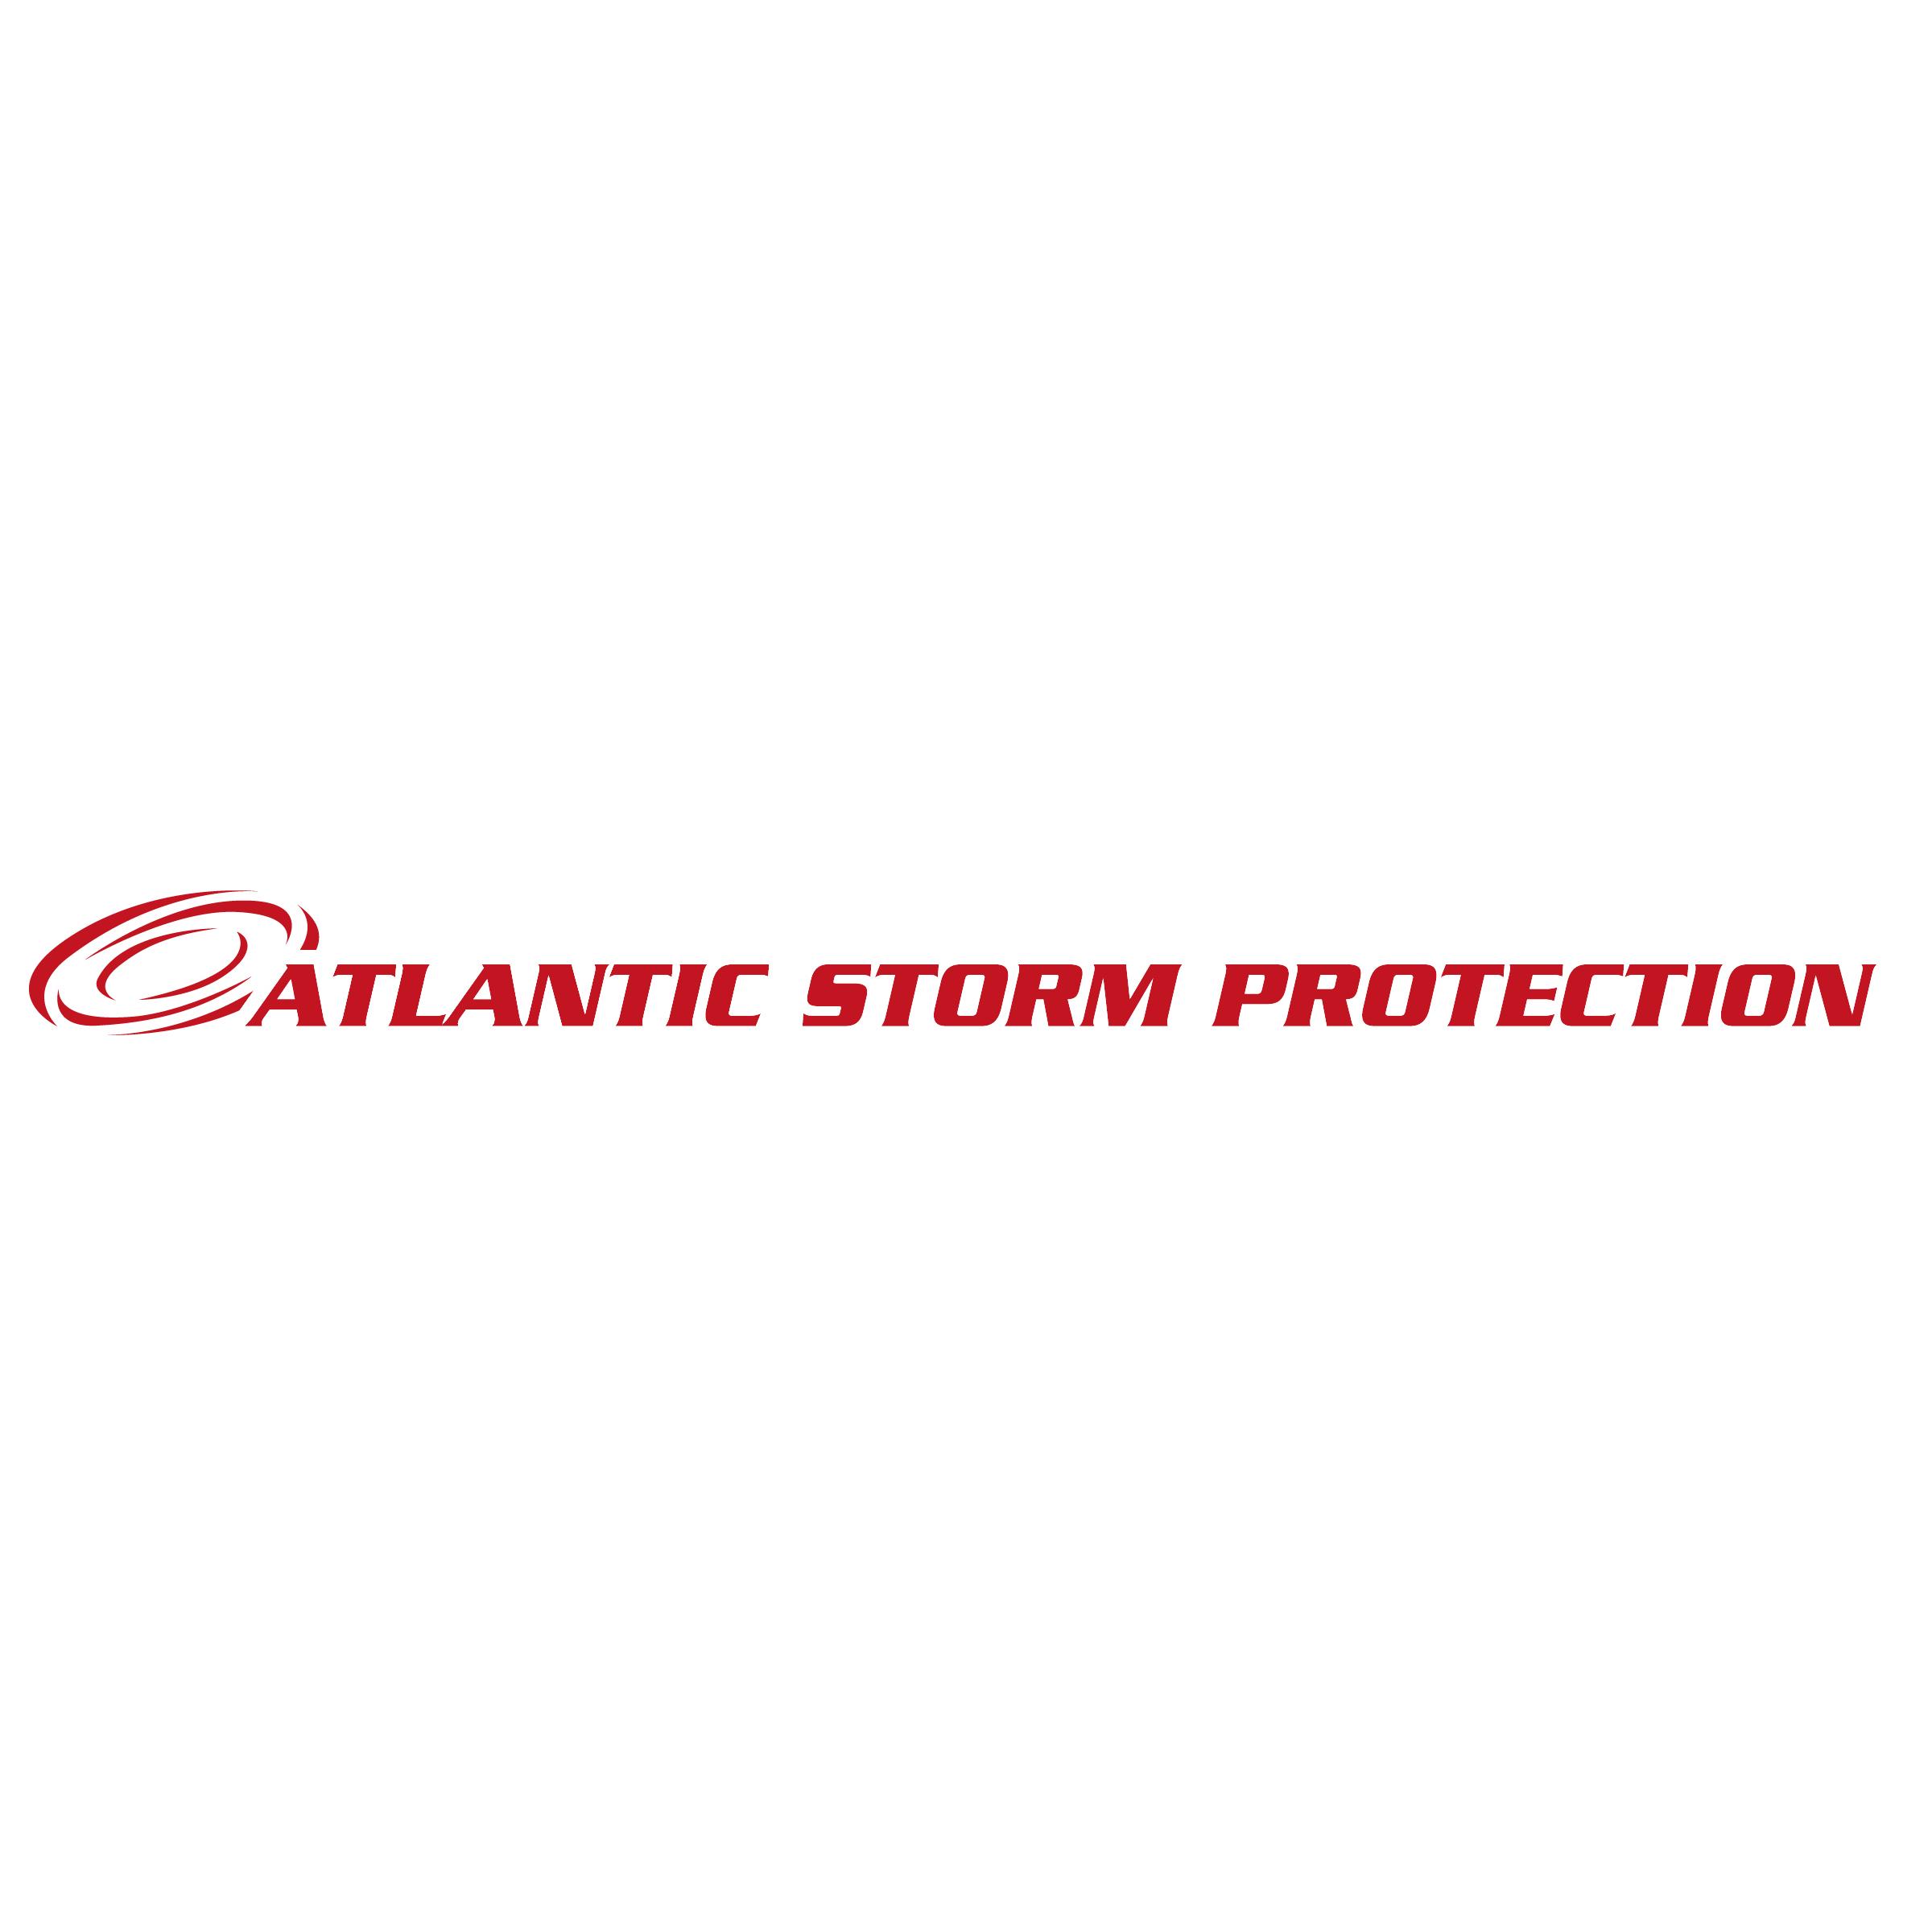 Atlantic Storm Protection